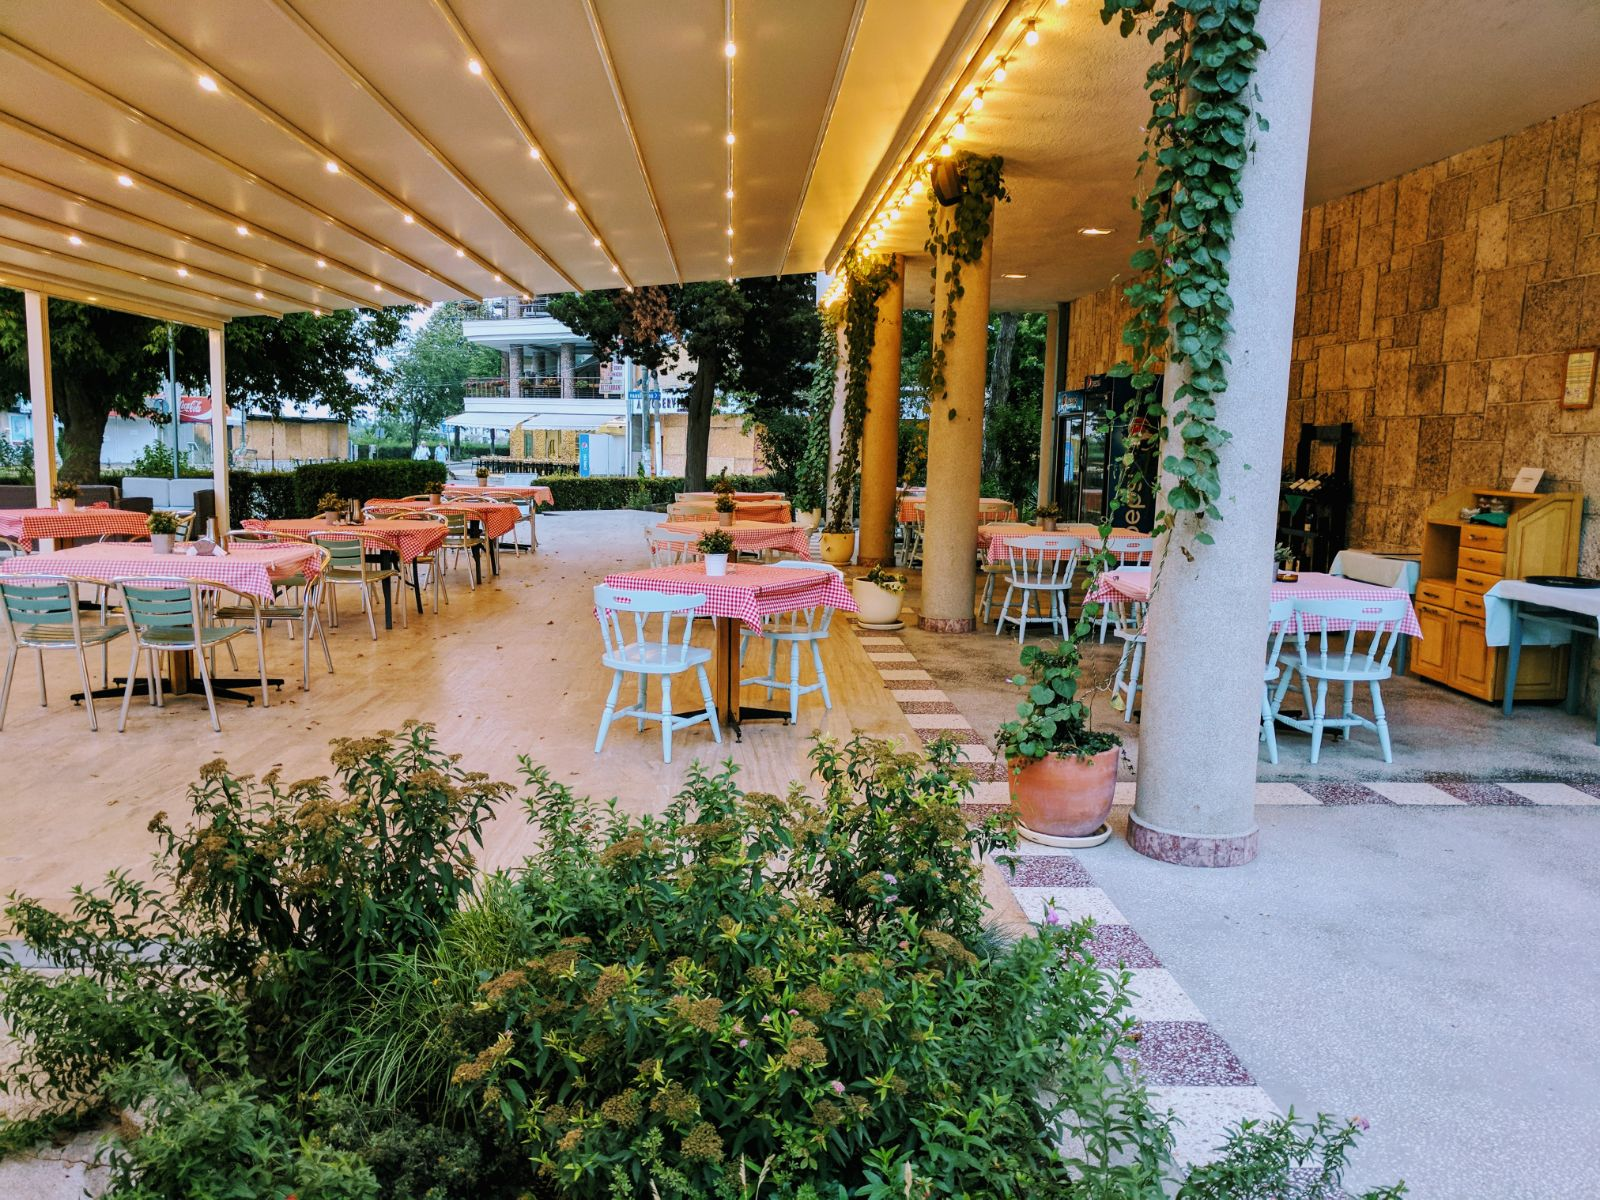 HOTEL CARMEN - Mic dejun - 5 nopti